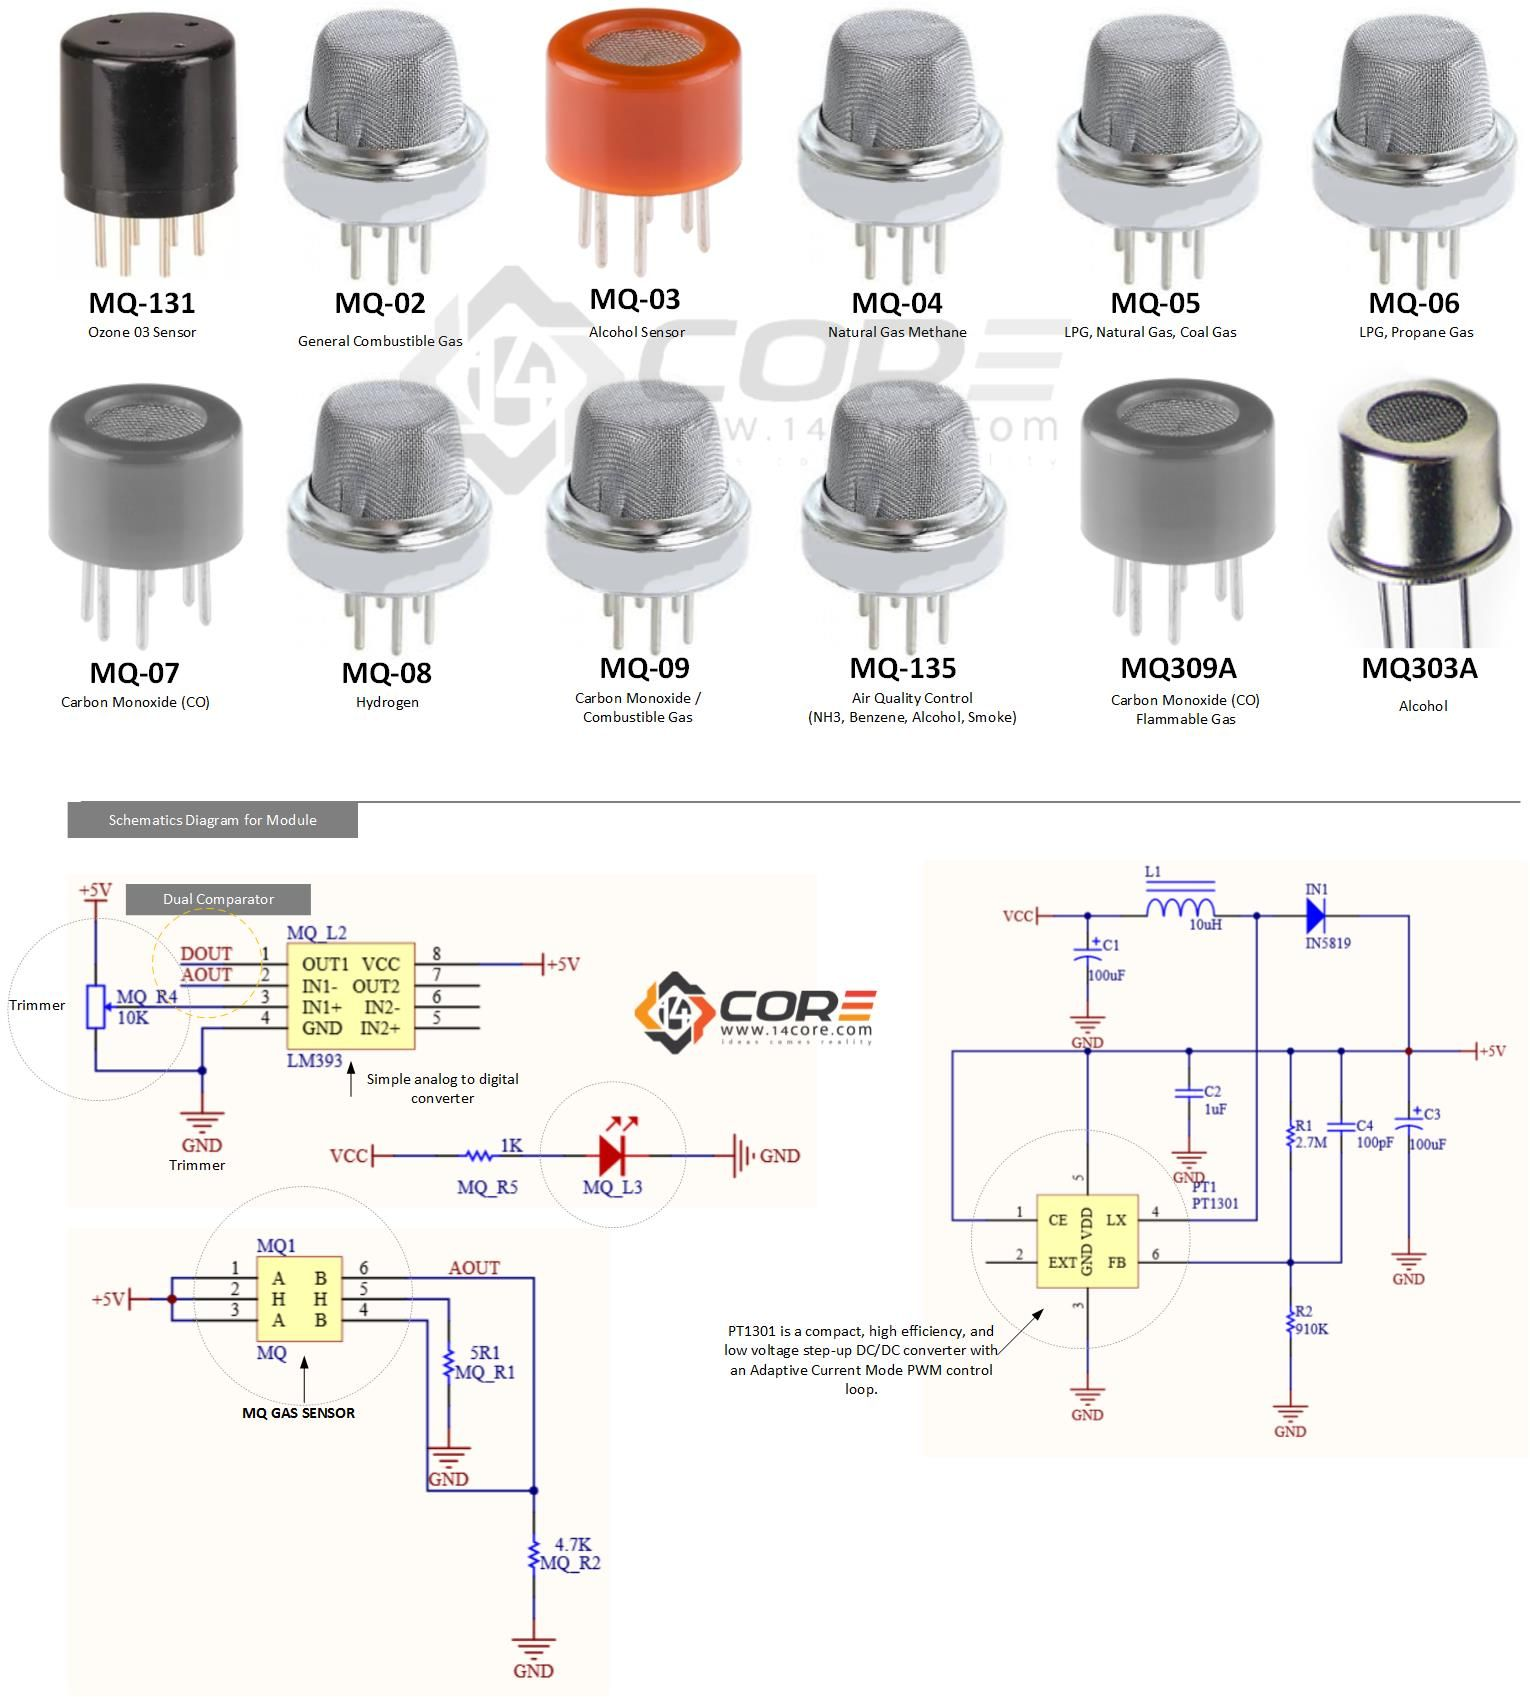 hight resolution of wiring the mq xx sensor for ozone lpg c3h8 co h c2h6o c6h6 gas detection on stm32f 14core com